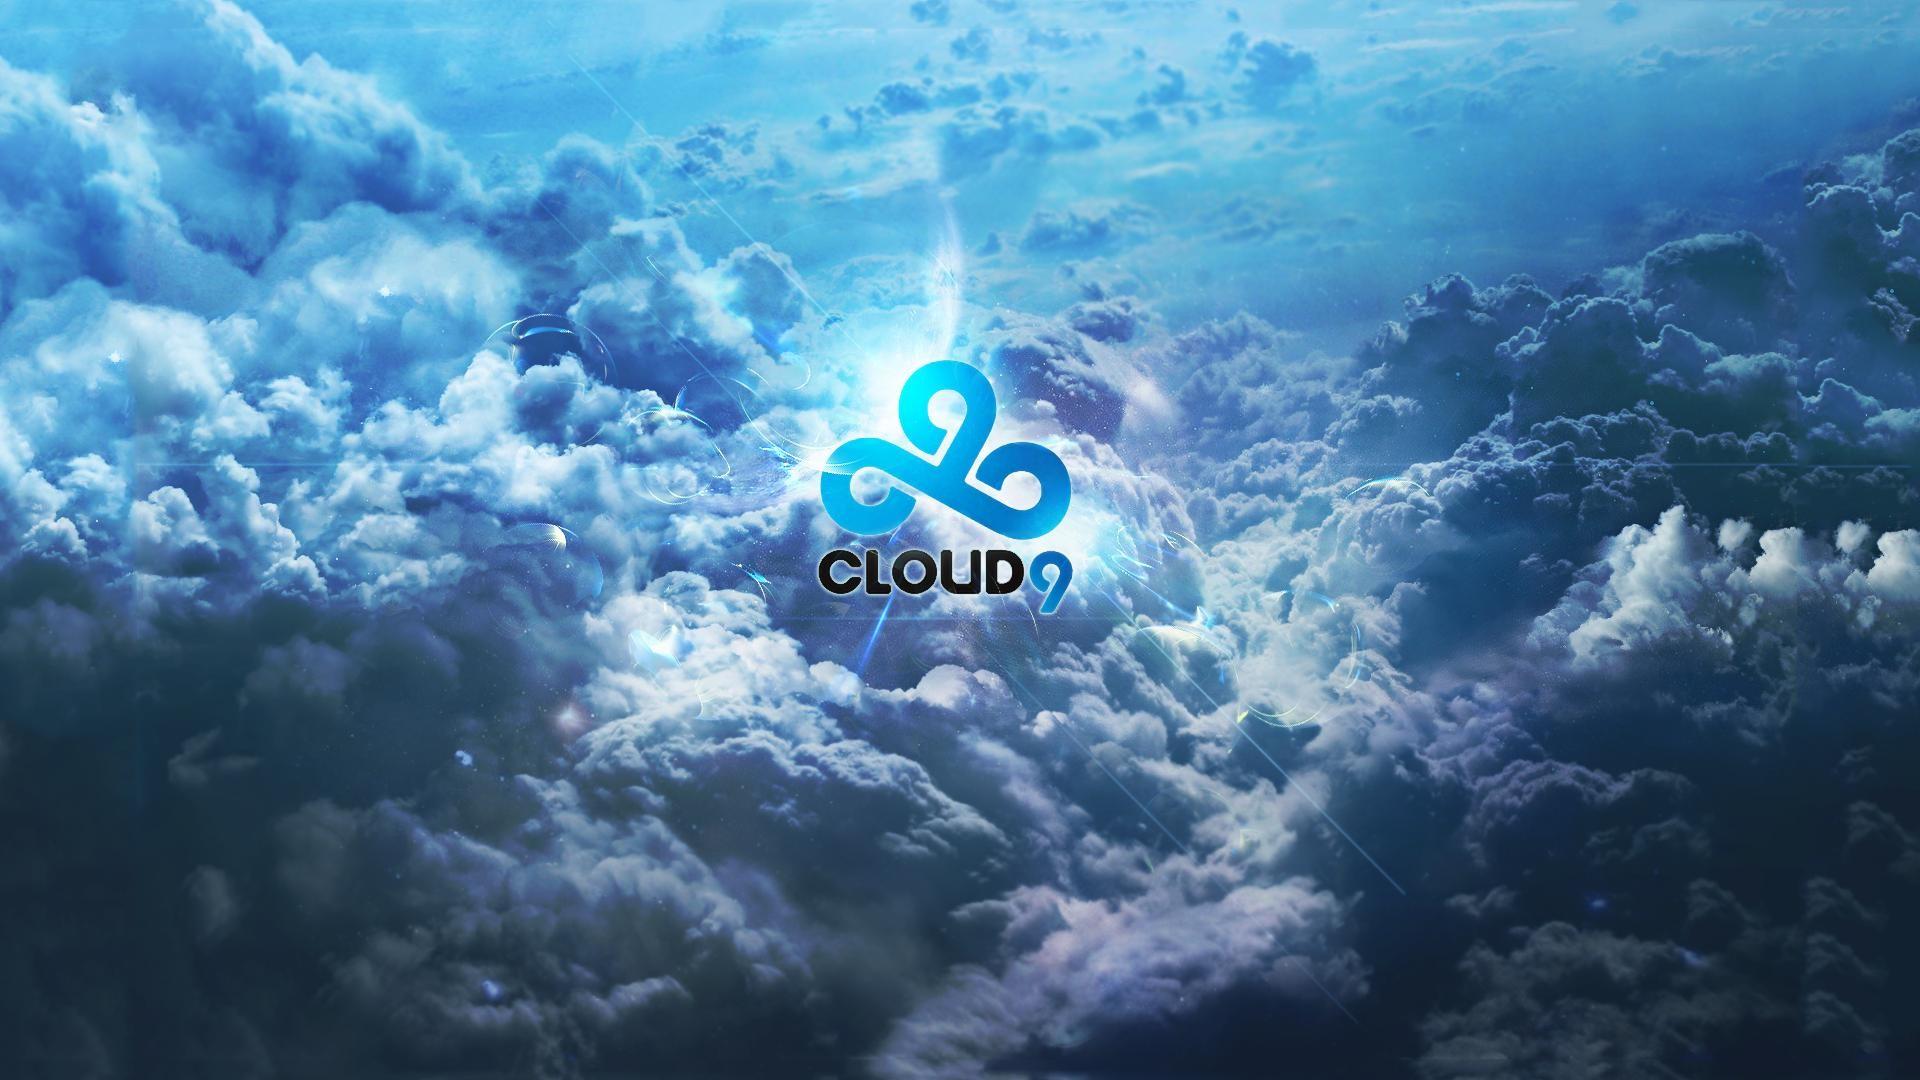 C9 Logo. Cloud9 Wallpaper